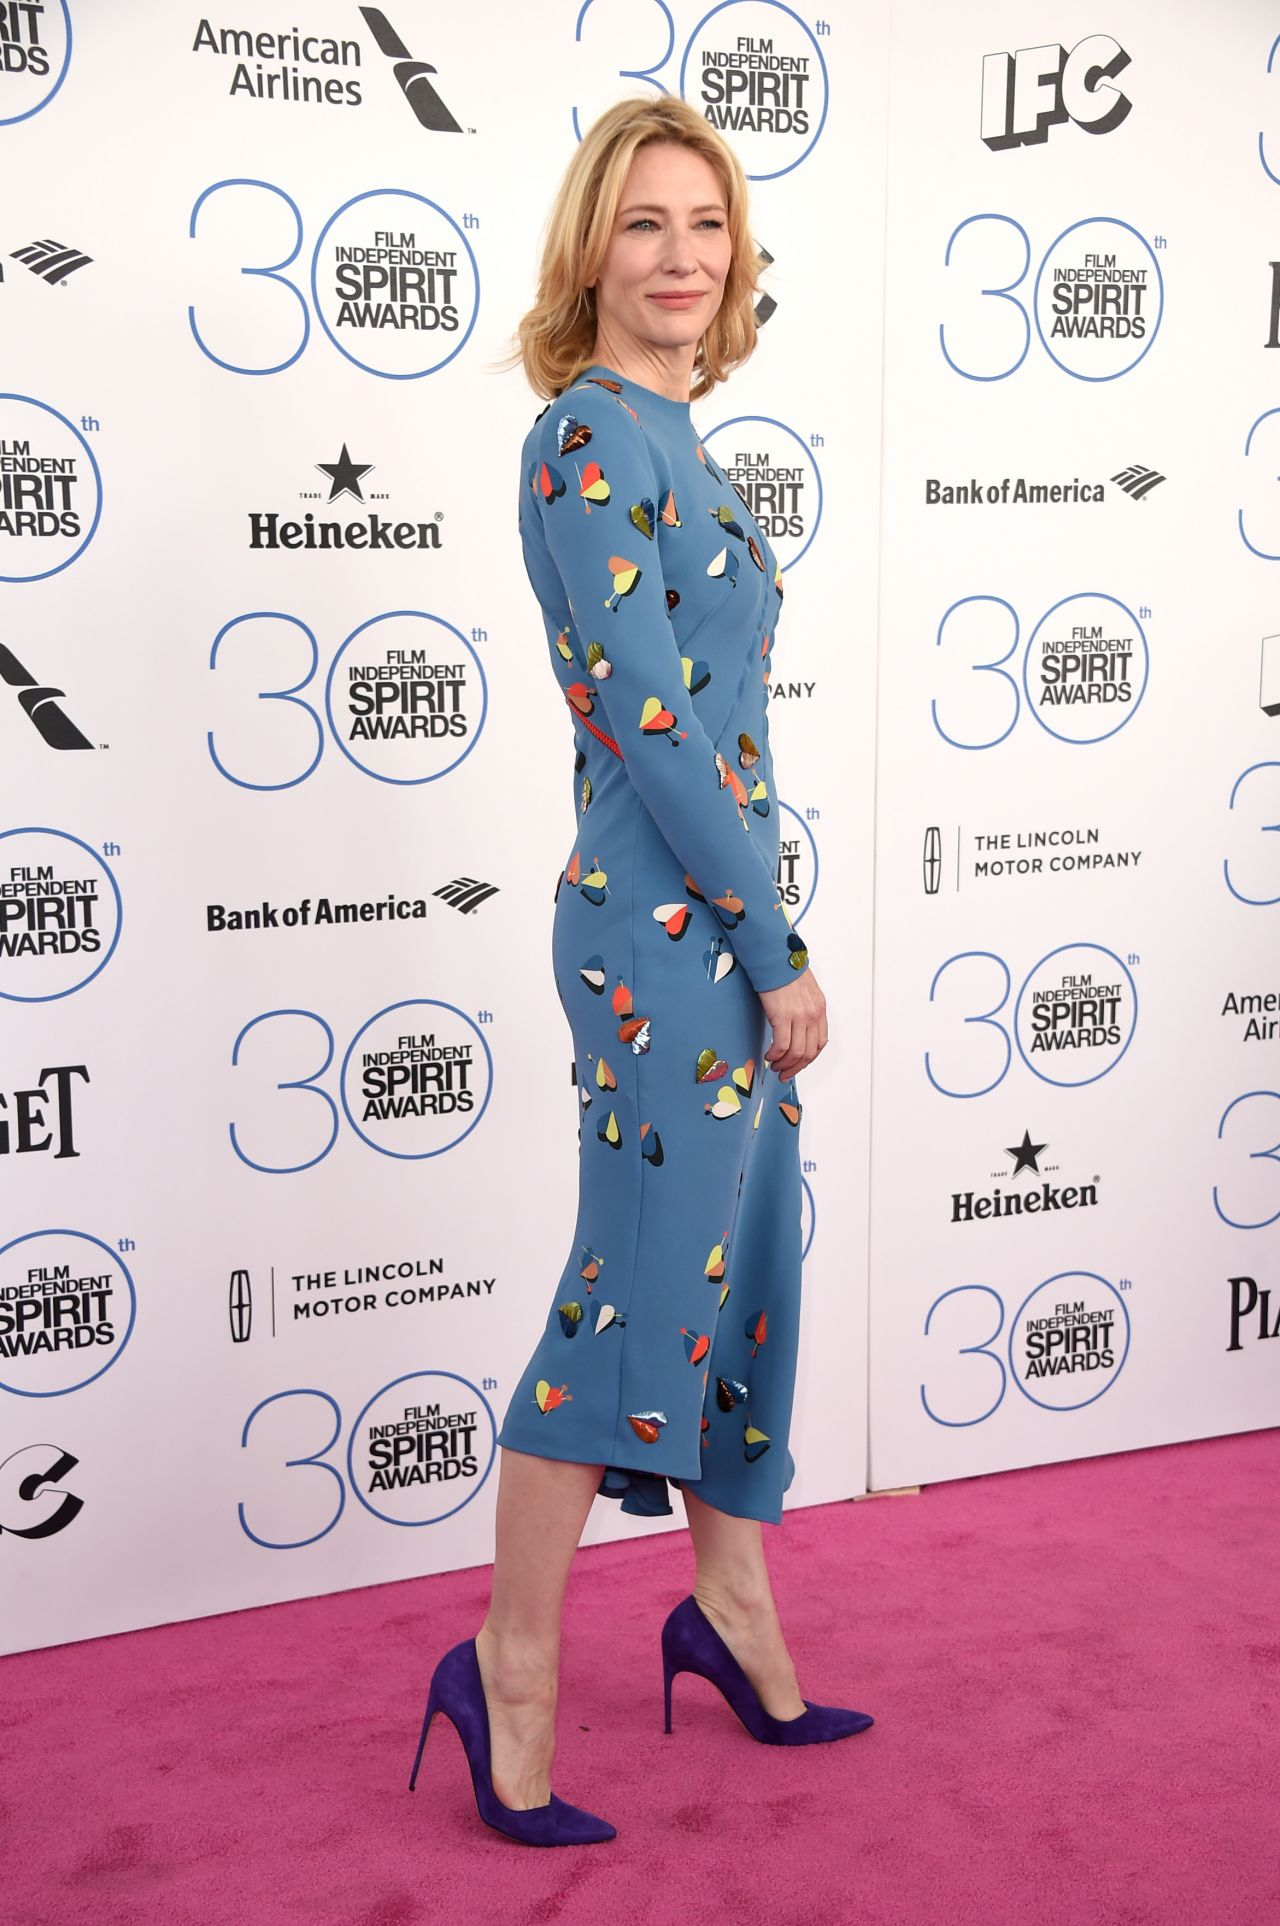 cate-blanchett-schiaparelli-couture-2015-film-independent-spirit-awards